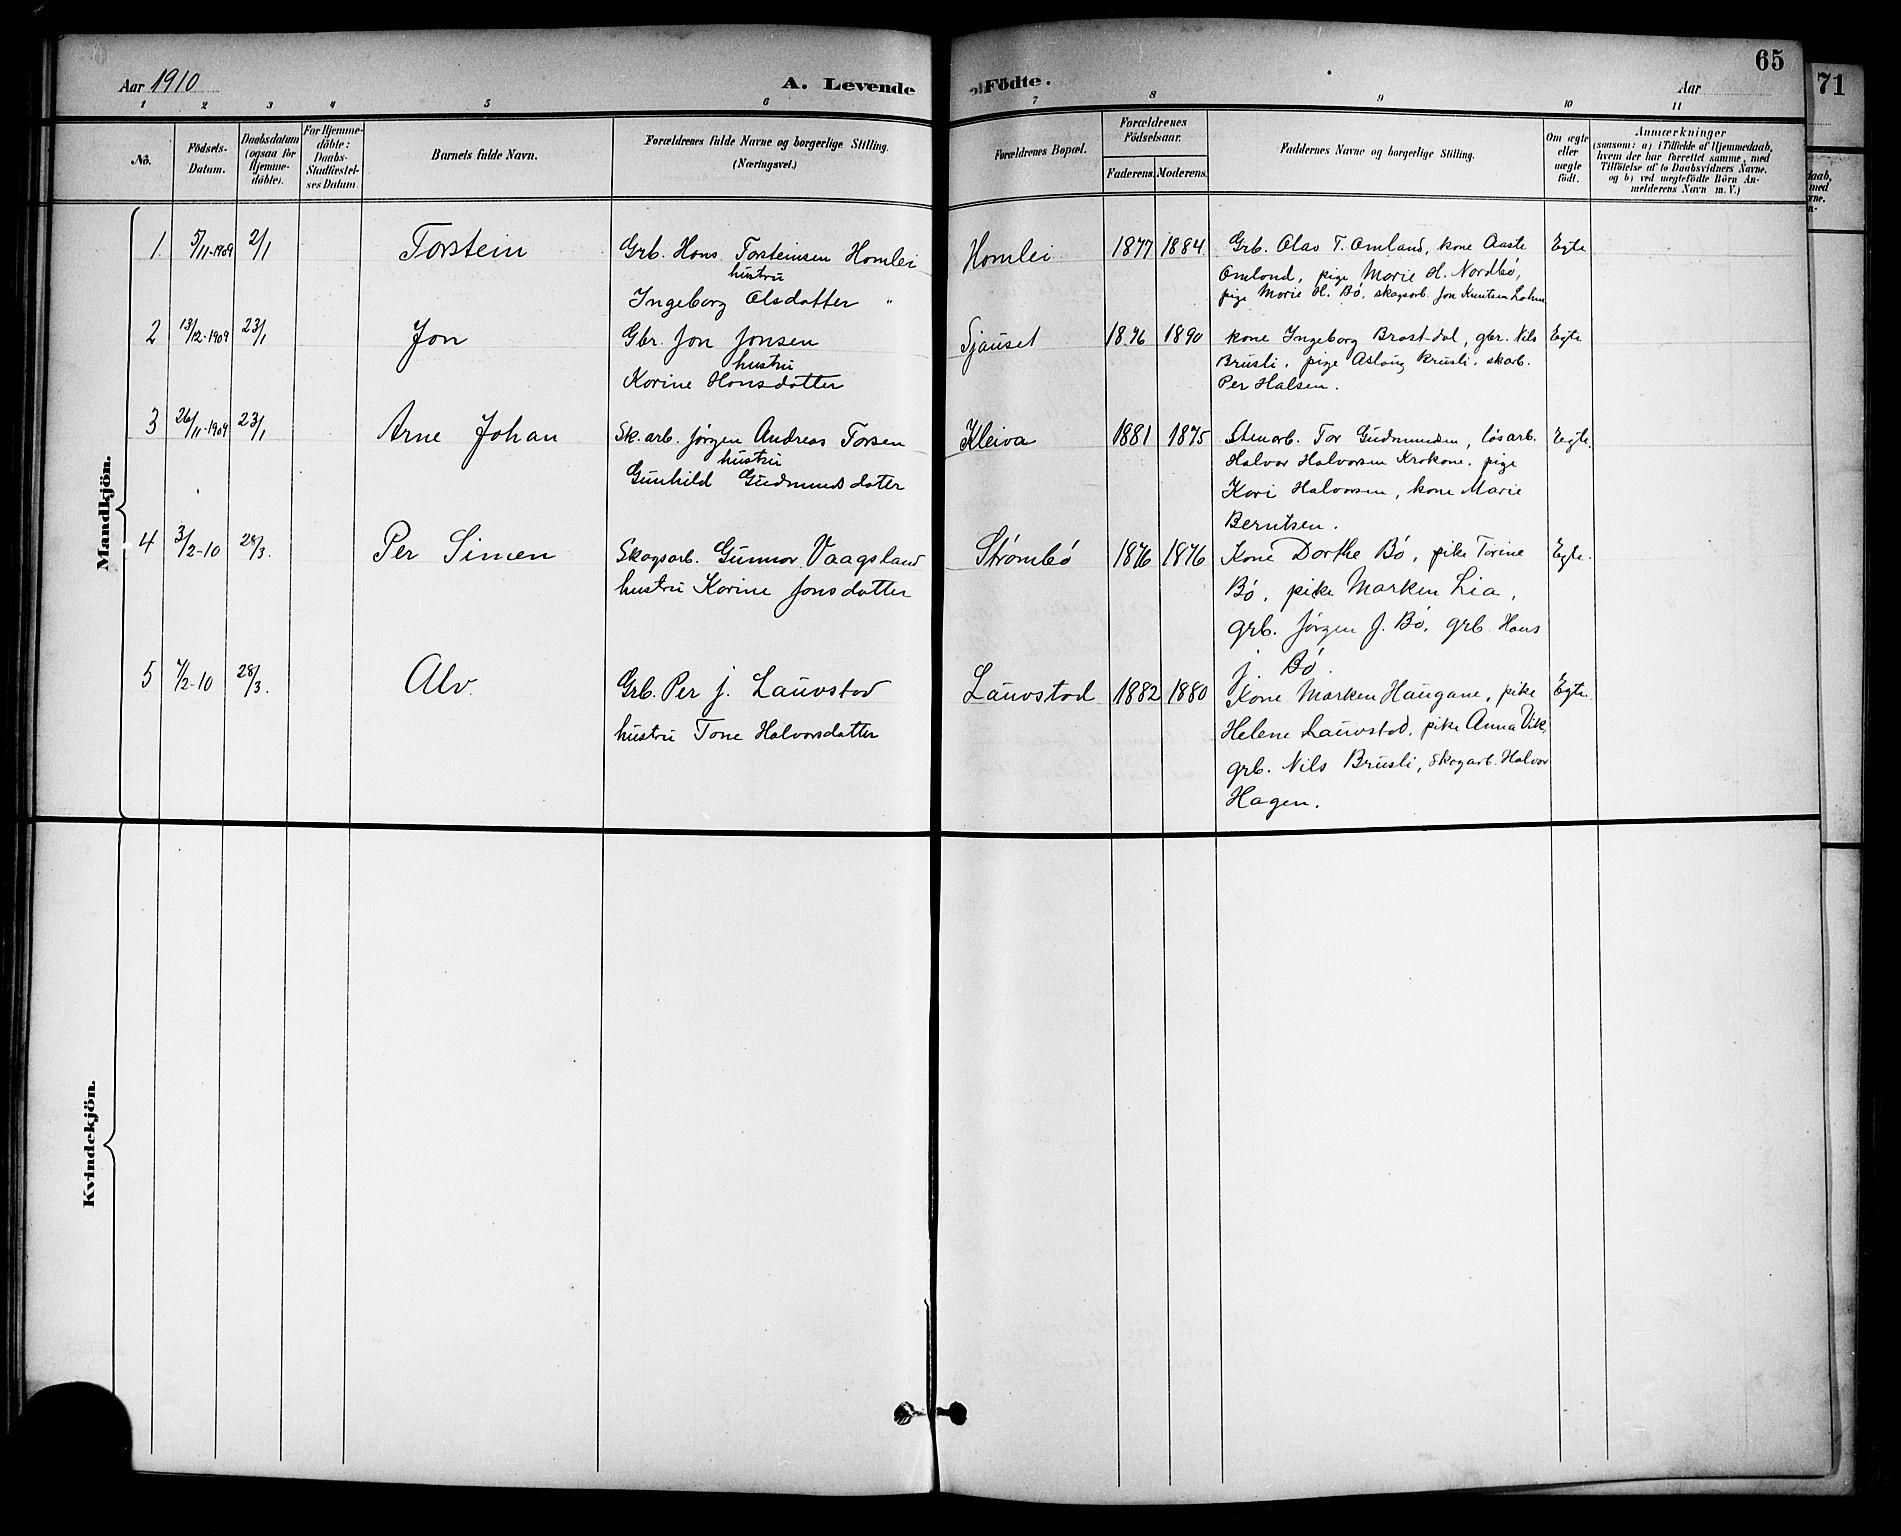 SAKO, Drangedal kirkebøker, G/Gb/L0002: Klokkerbok nr. II 2, 1895-1918, s. 65